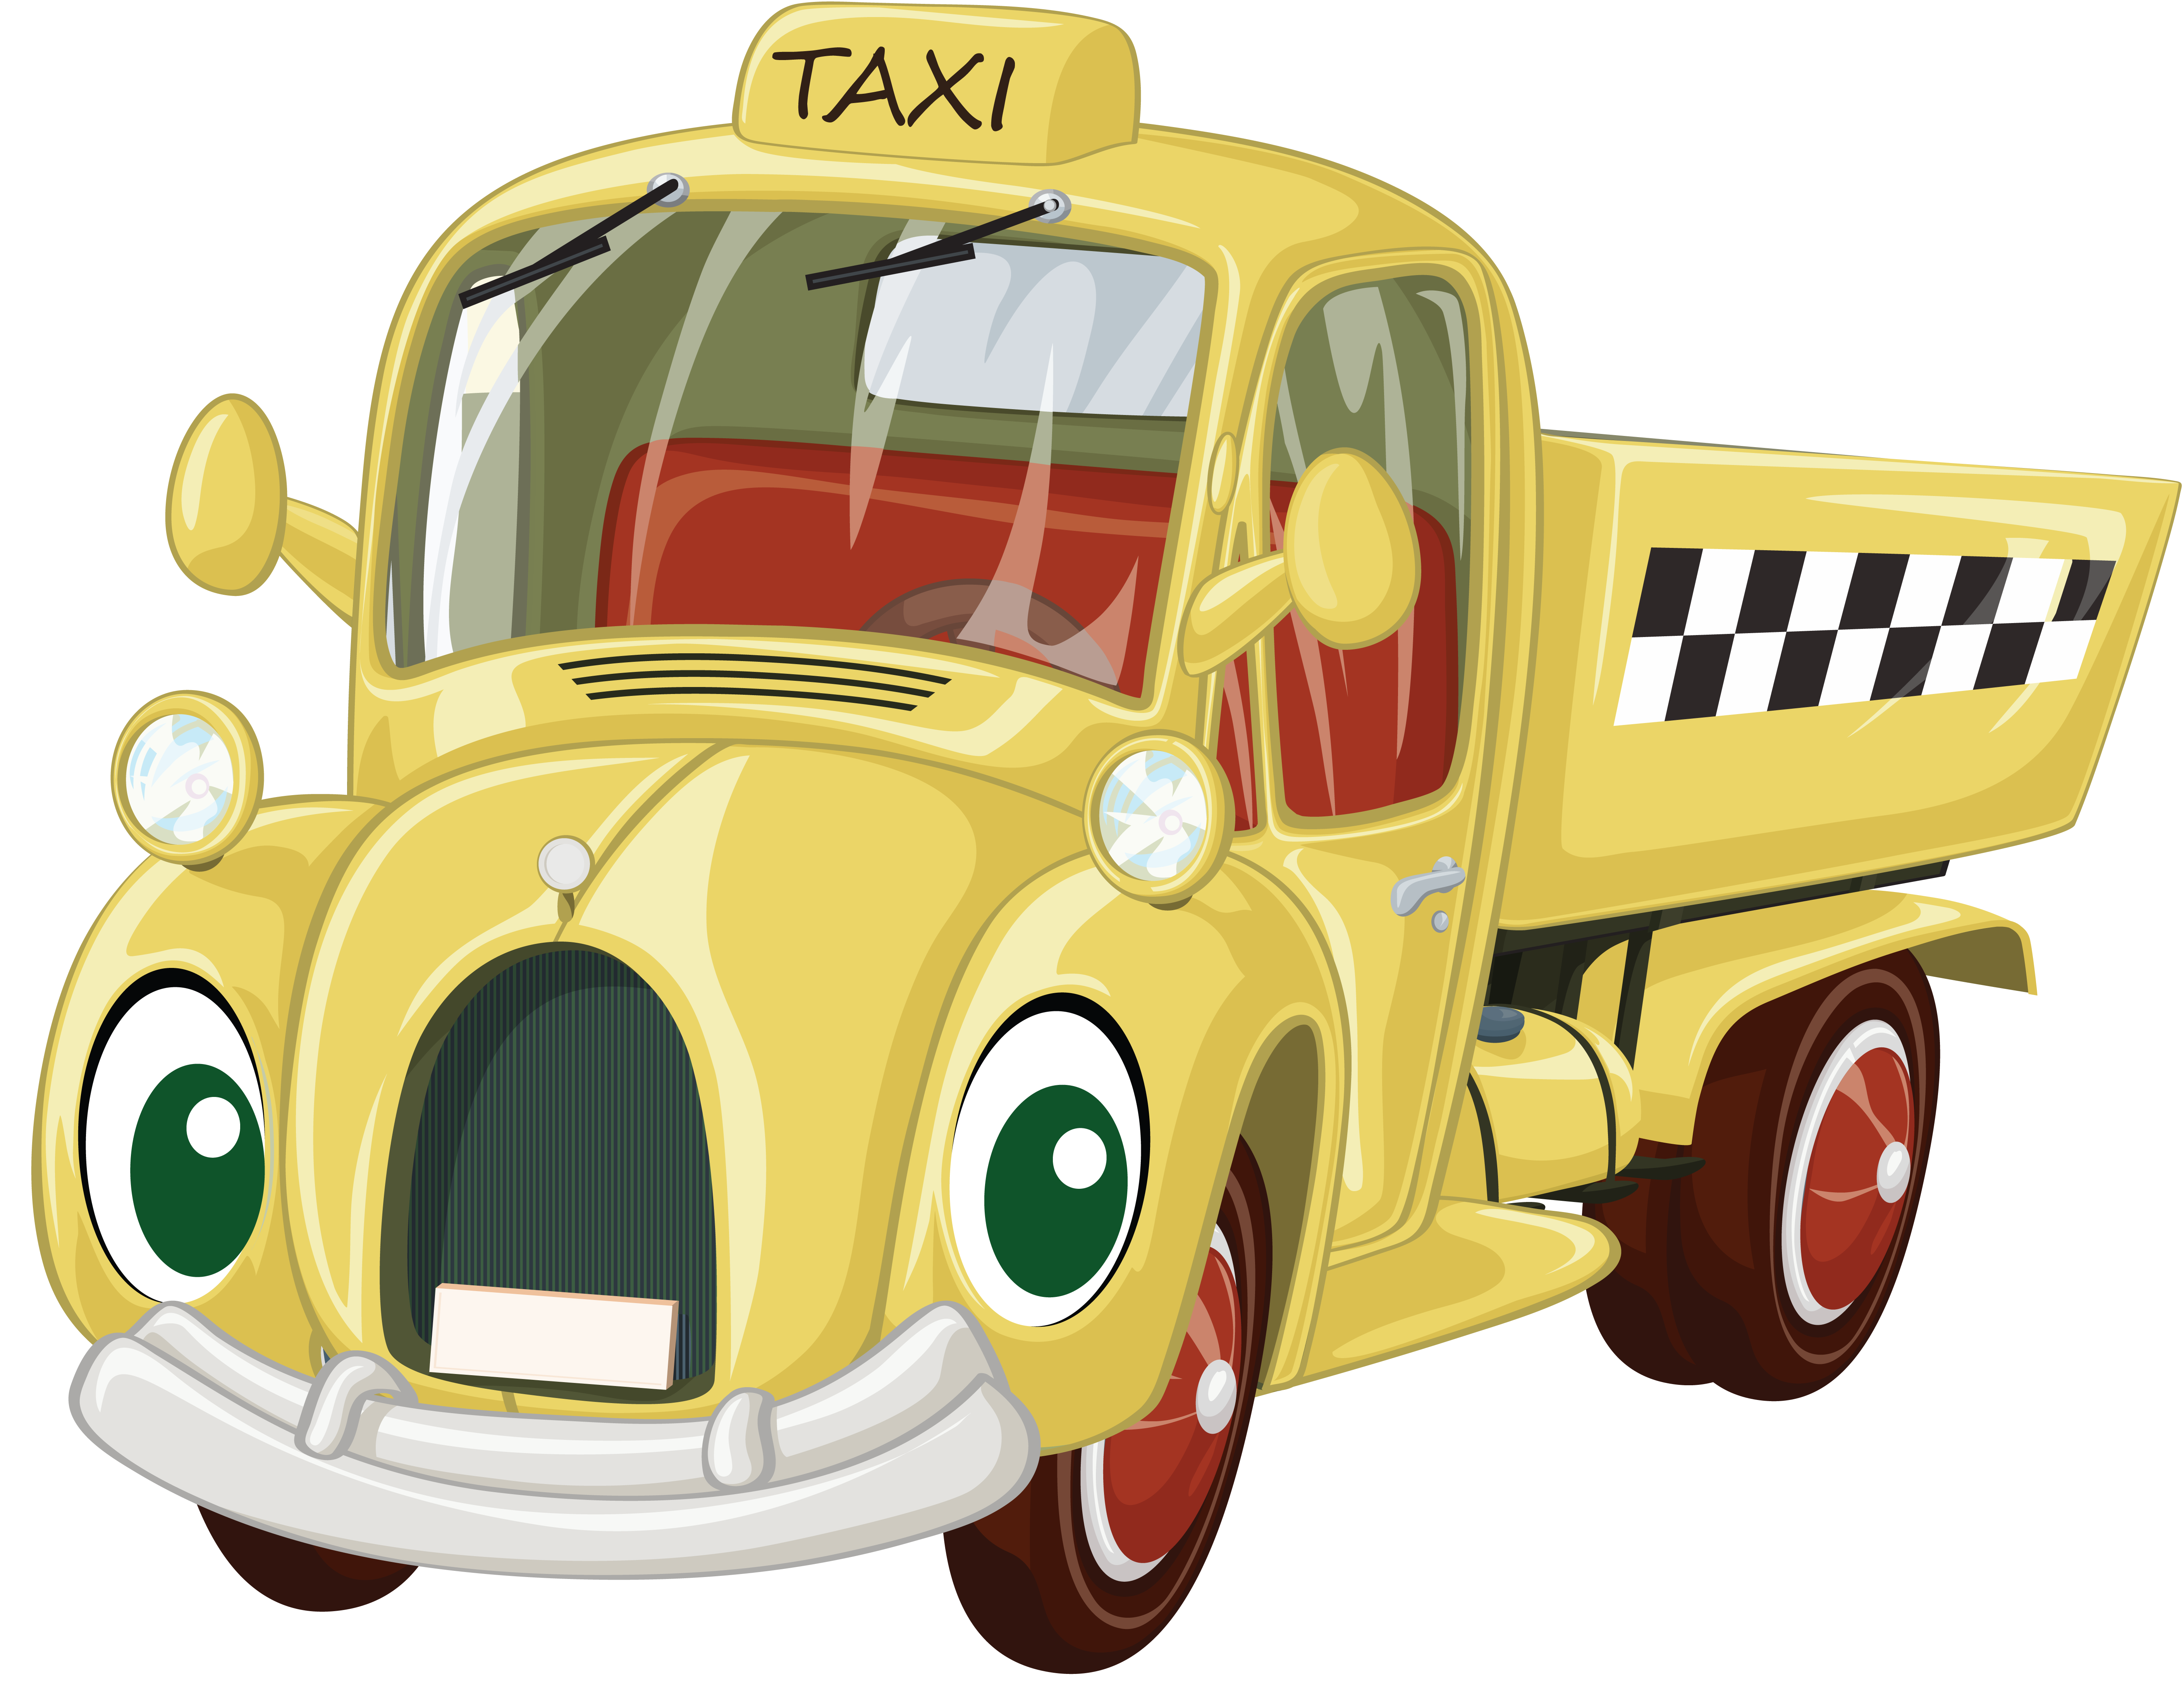 Cartoon clipart car banner royalty free download Cartoon truck PNG Clipart - Download free Car images in PNG banner royalty free download